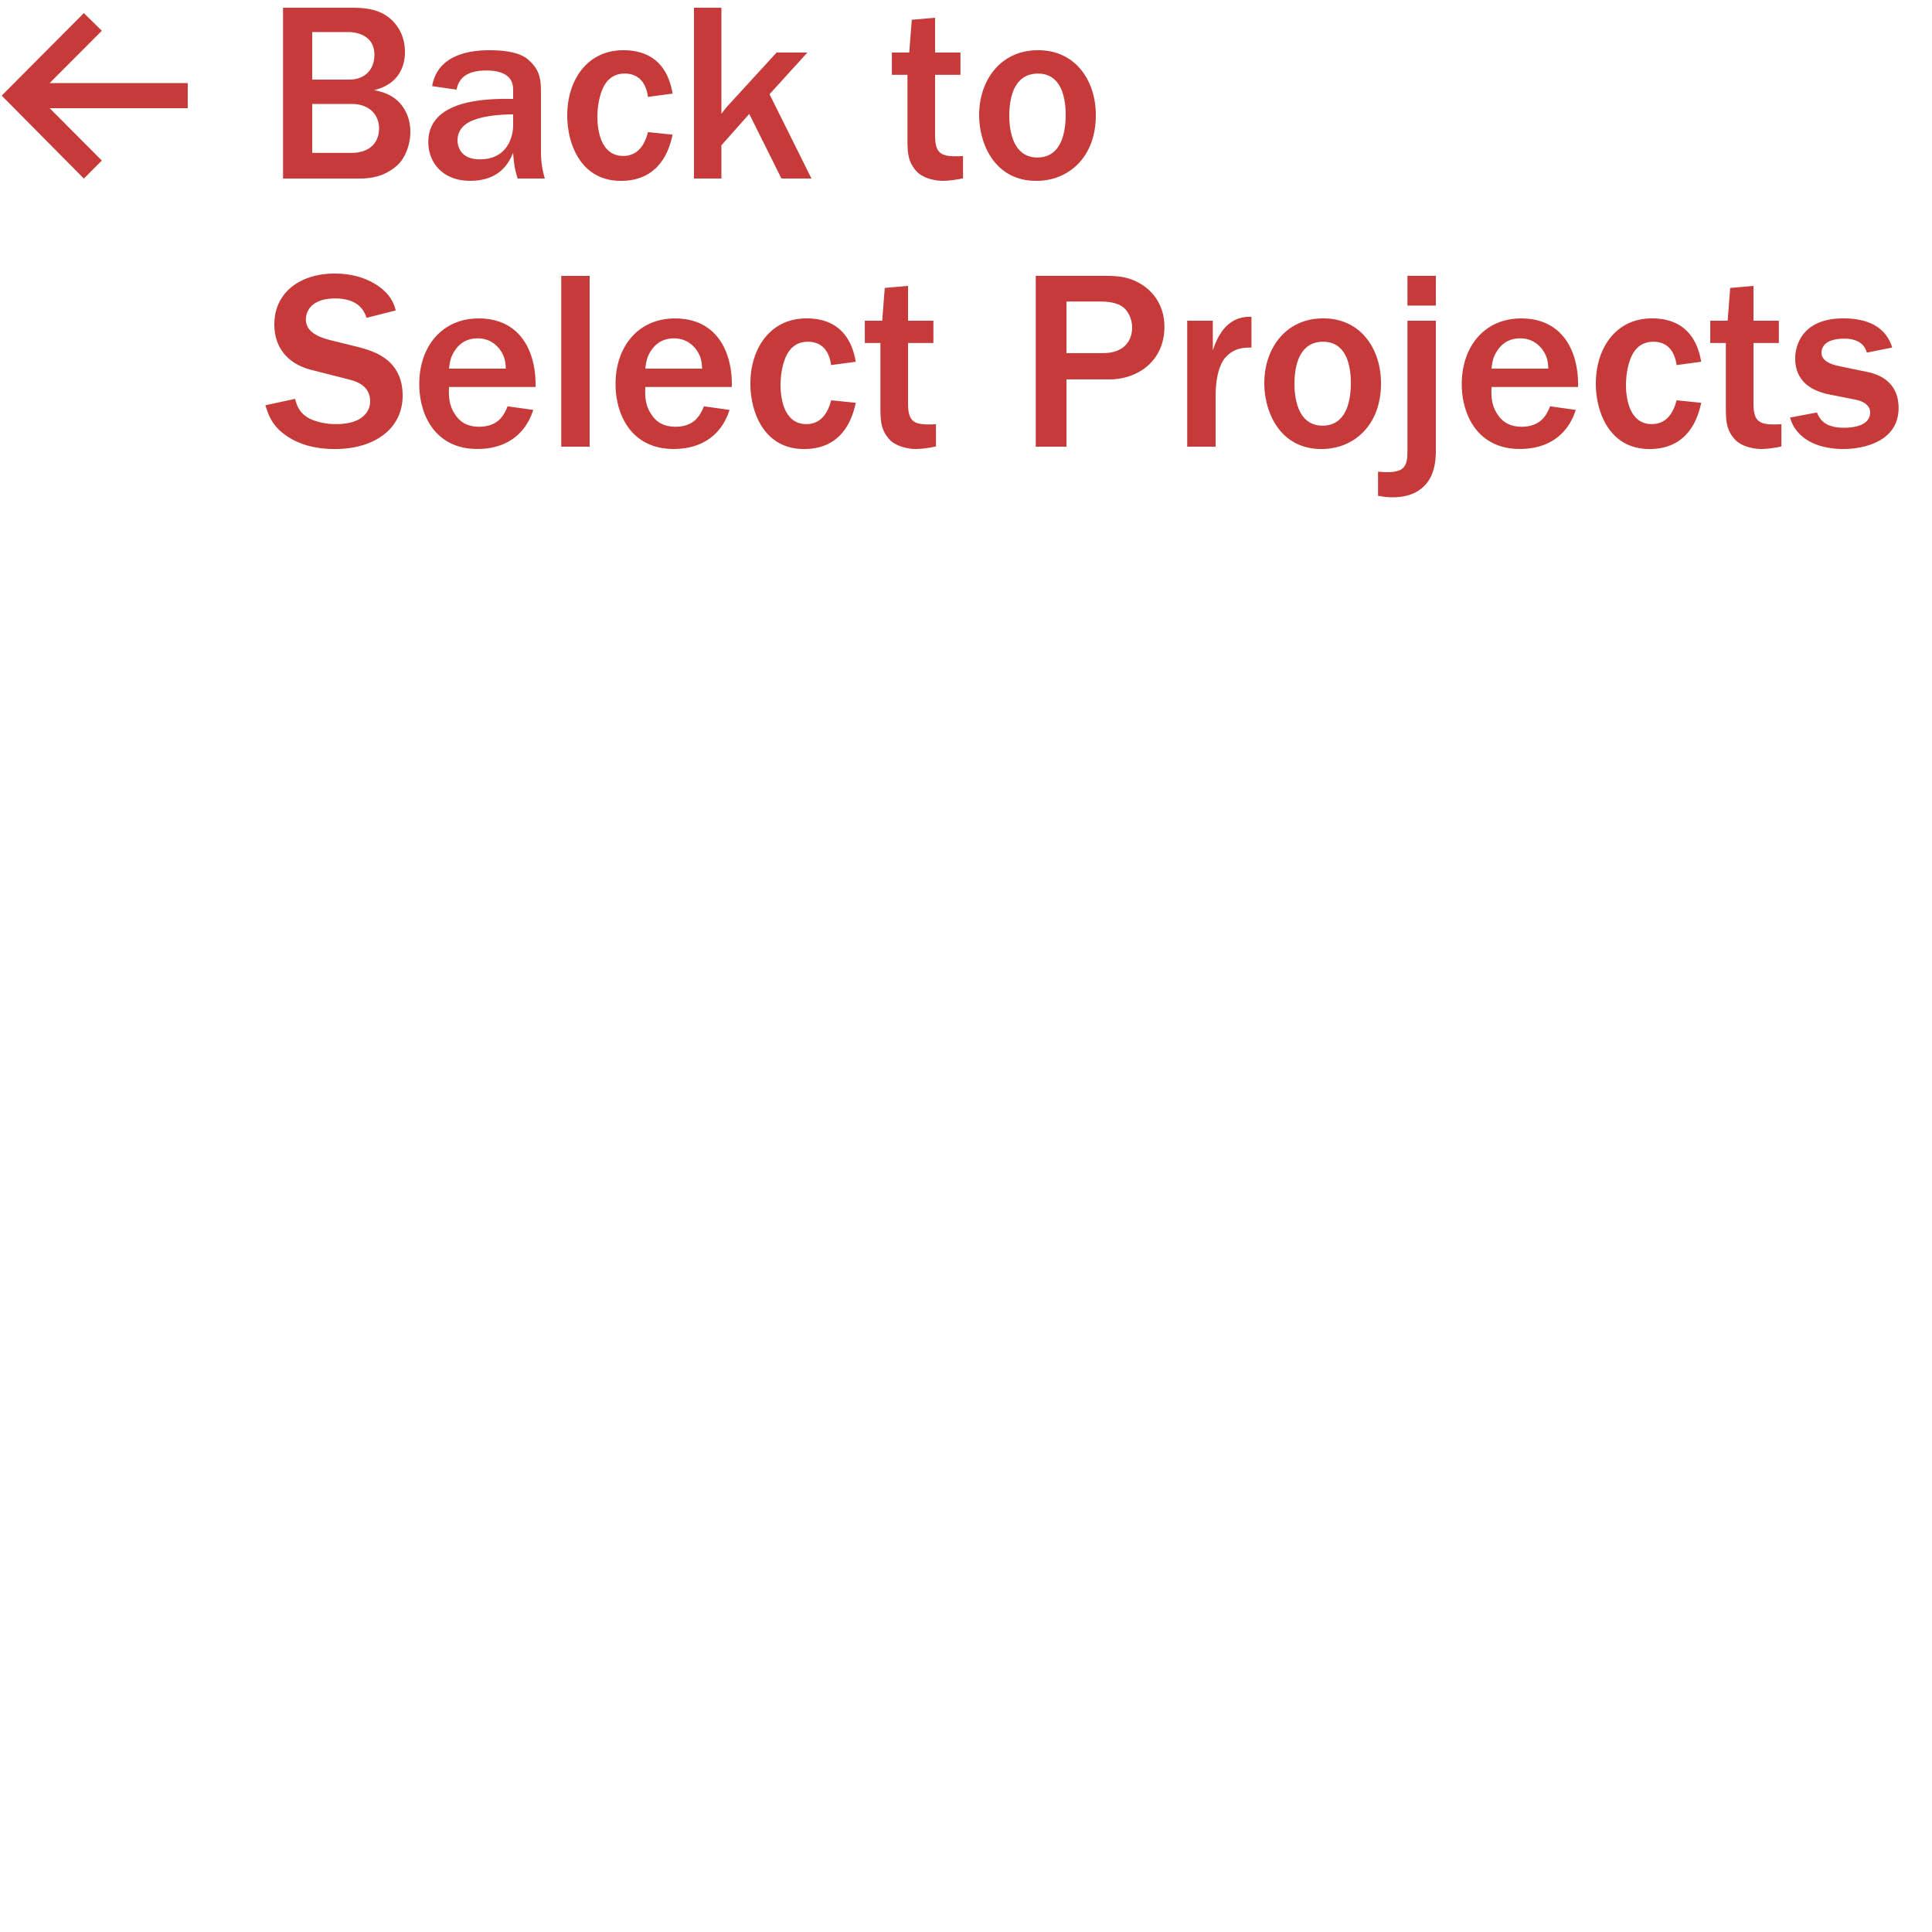 backtoselectprojects.jpg